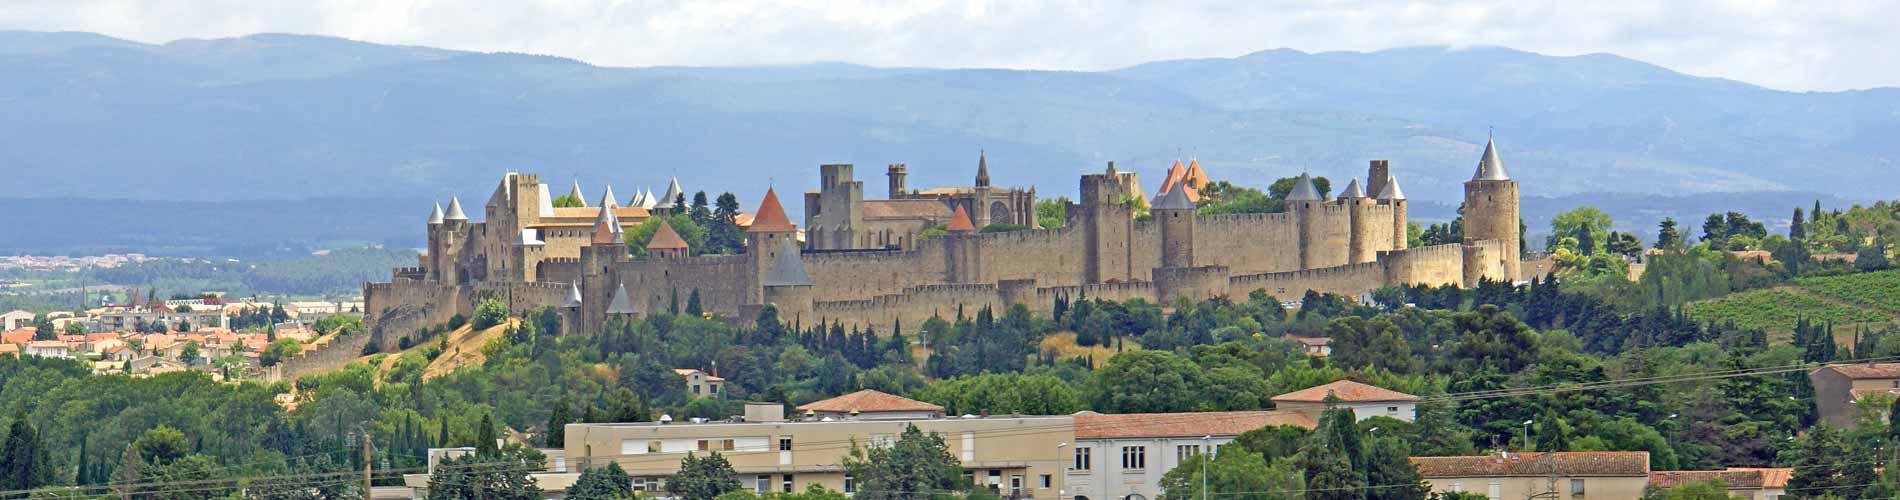 Carcassonne - 09.jpg